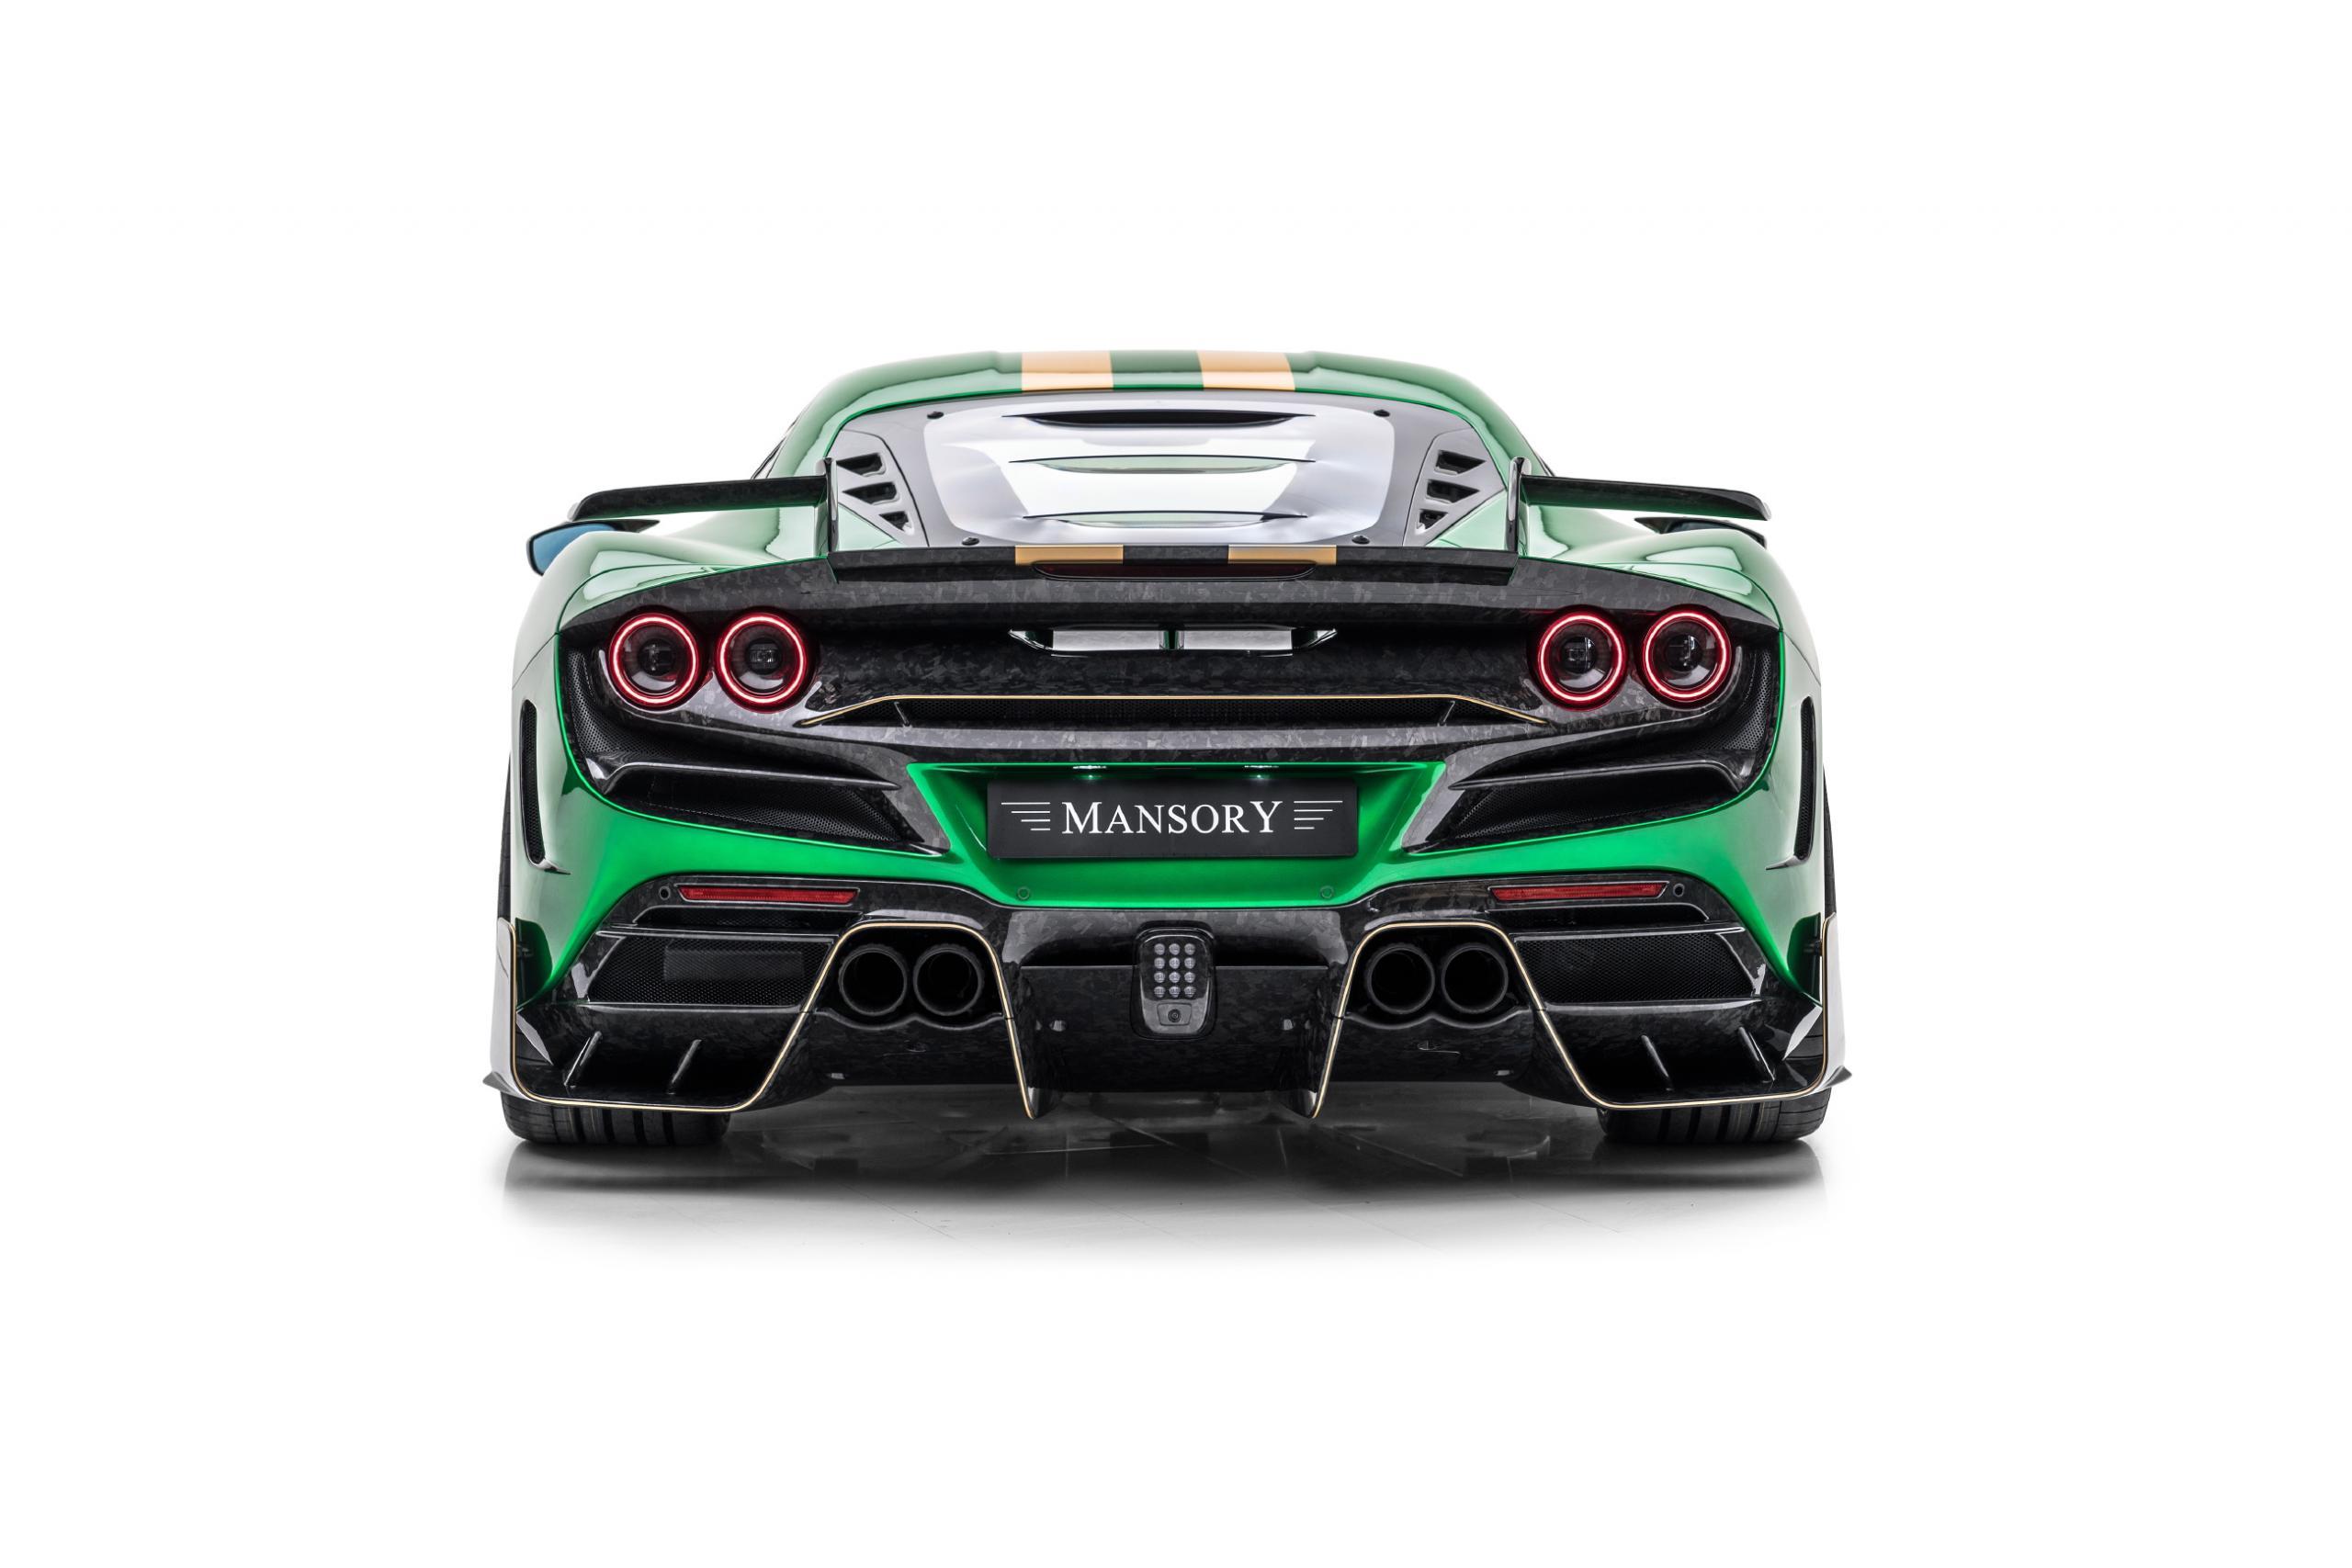 mansory f8xx ferrari f8 body kit carbon fiber rear bumper rear wing spoiler exhaust 2020 2021